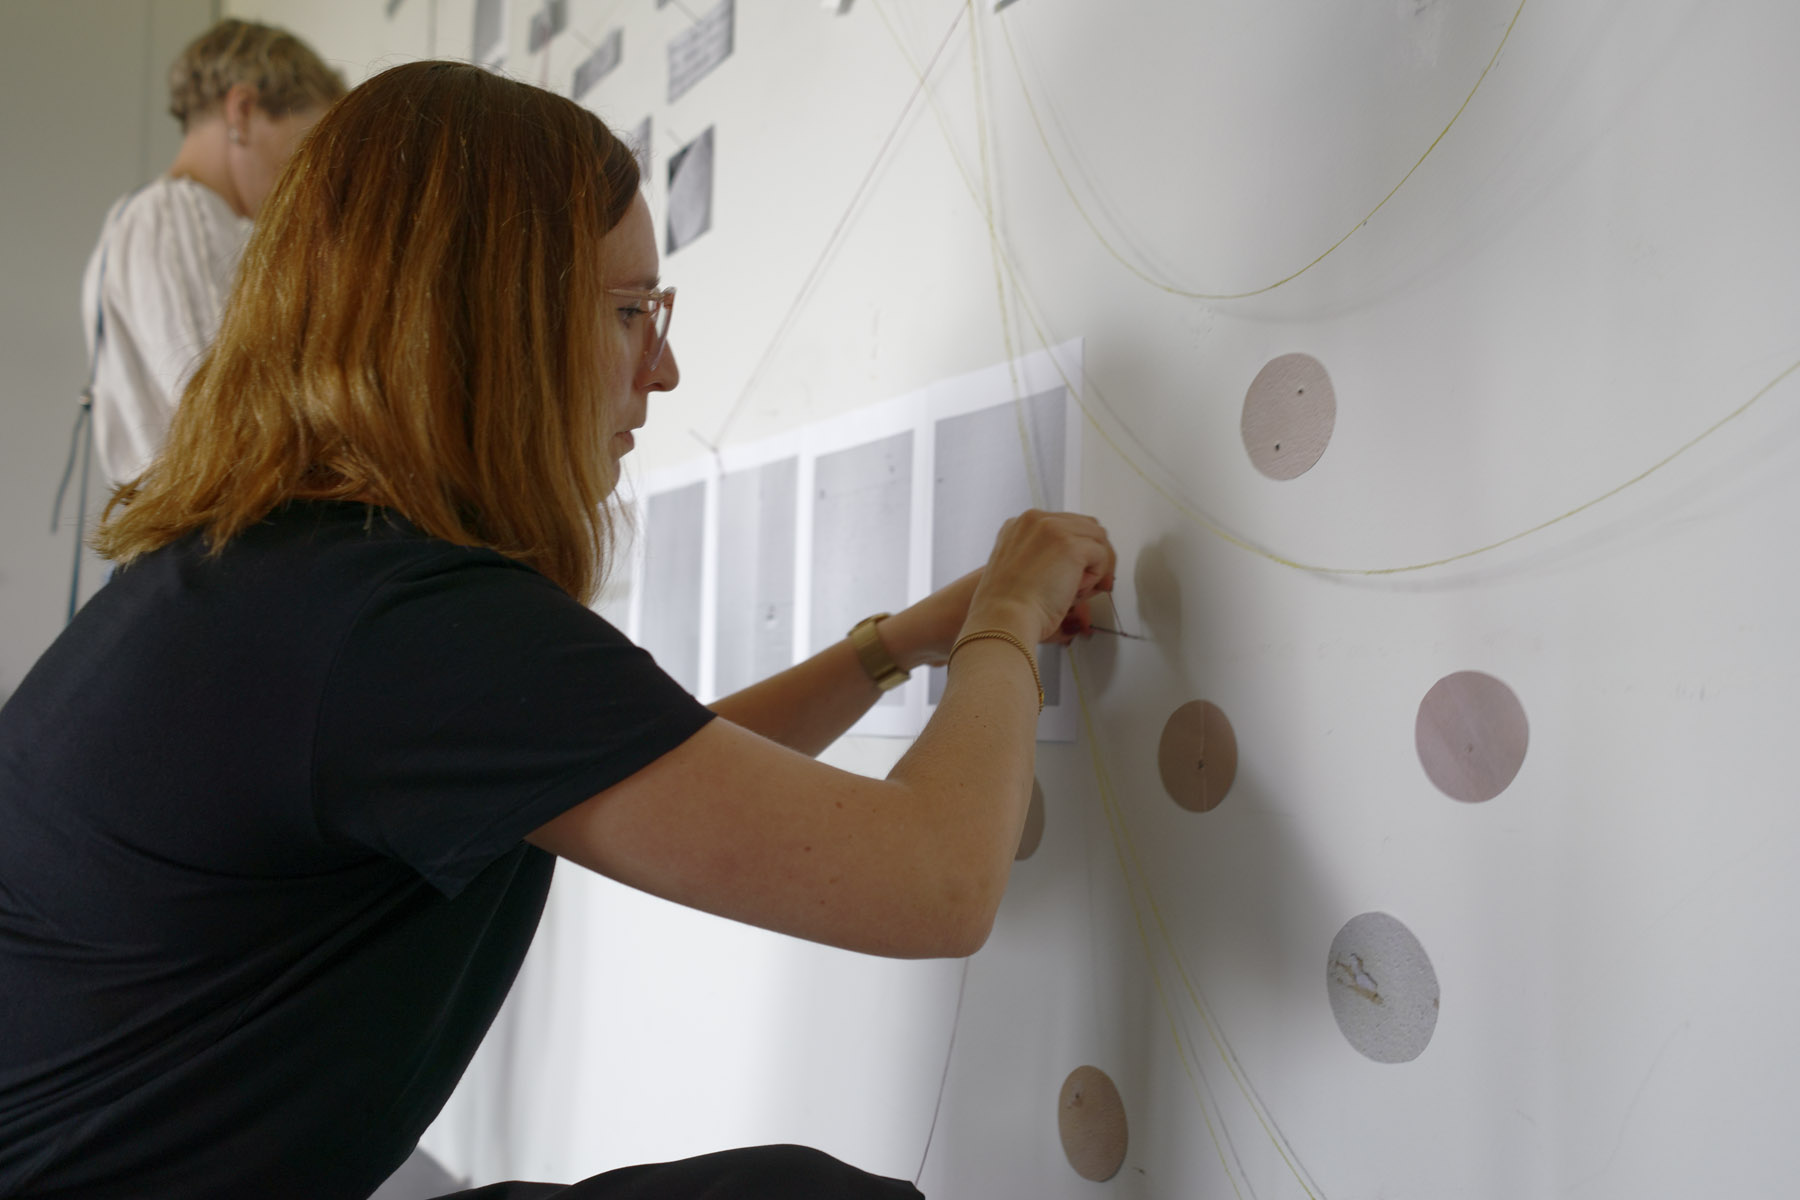 Symposium participants in artist-teacher led workshops